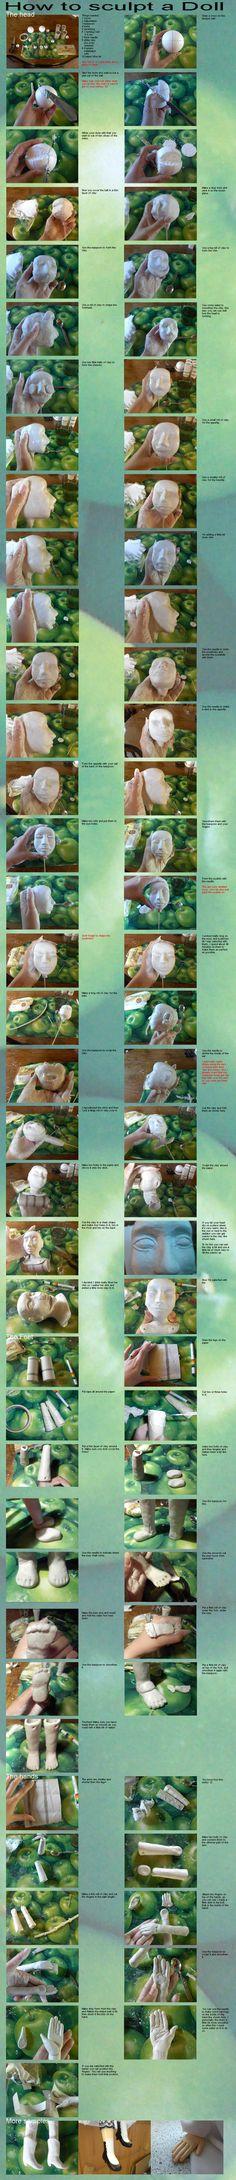 How to sculpt a doll-tutorial- by ~Hamkaastostie on deviantART